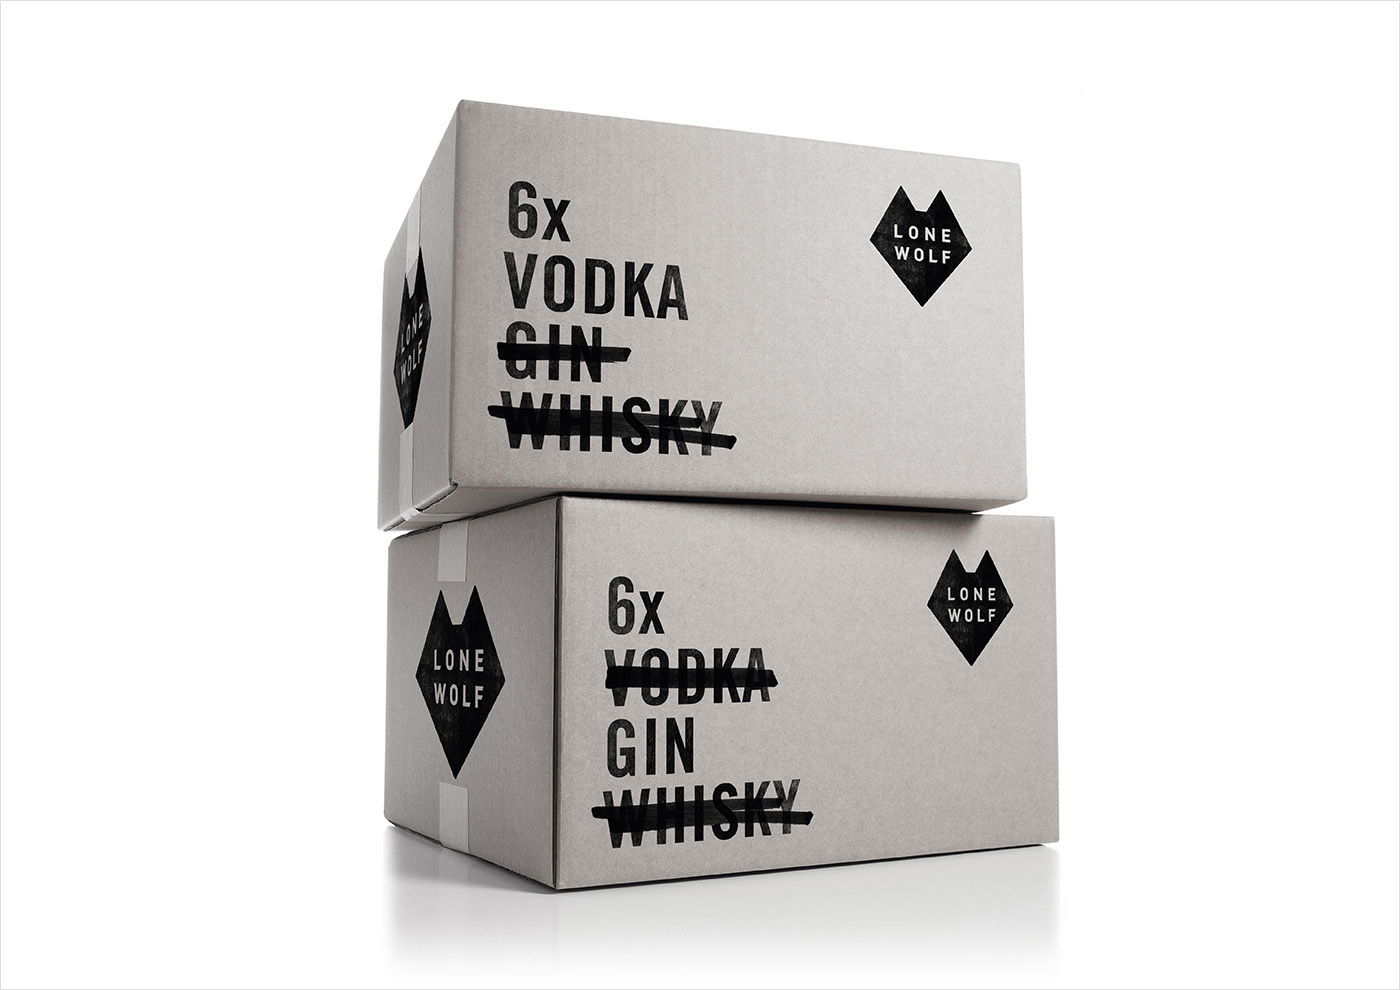 Logo and packaging design by London-based B&B Studio for Brewdog's craft spirits range Lone Wolf